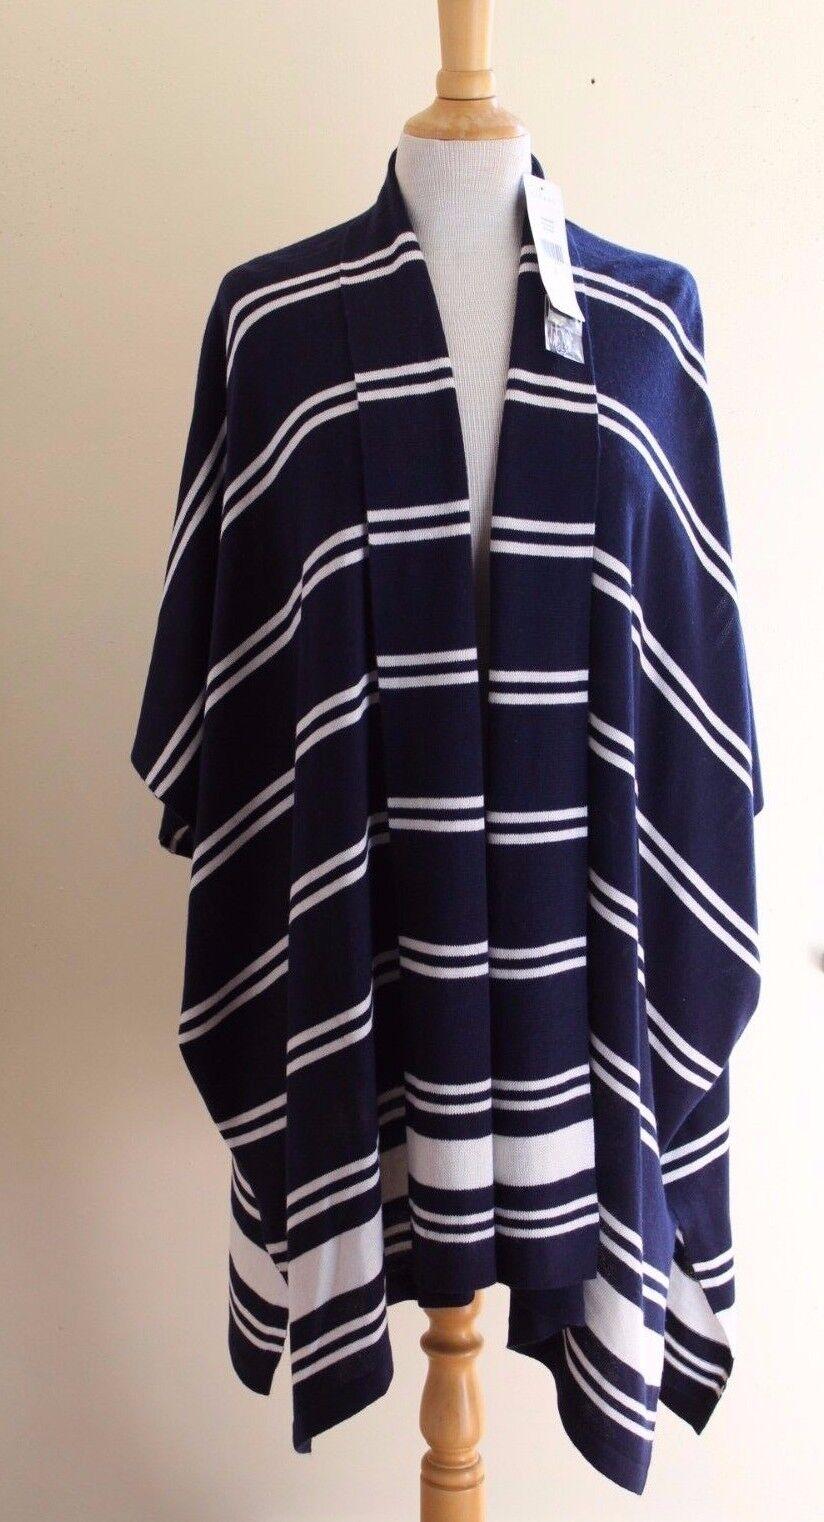 NWT Ralph Lauren Navy Lagenlook Silk Cashmere Indian Art-to-Wear Sweater Sz M